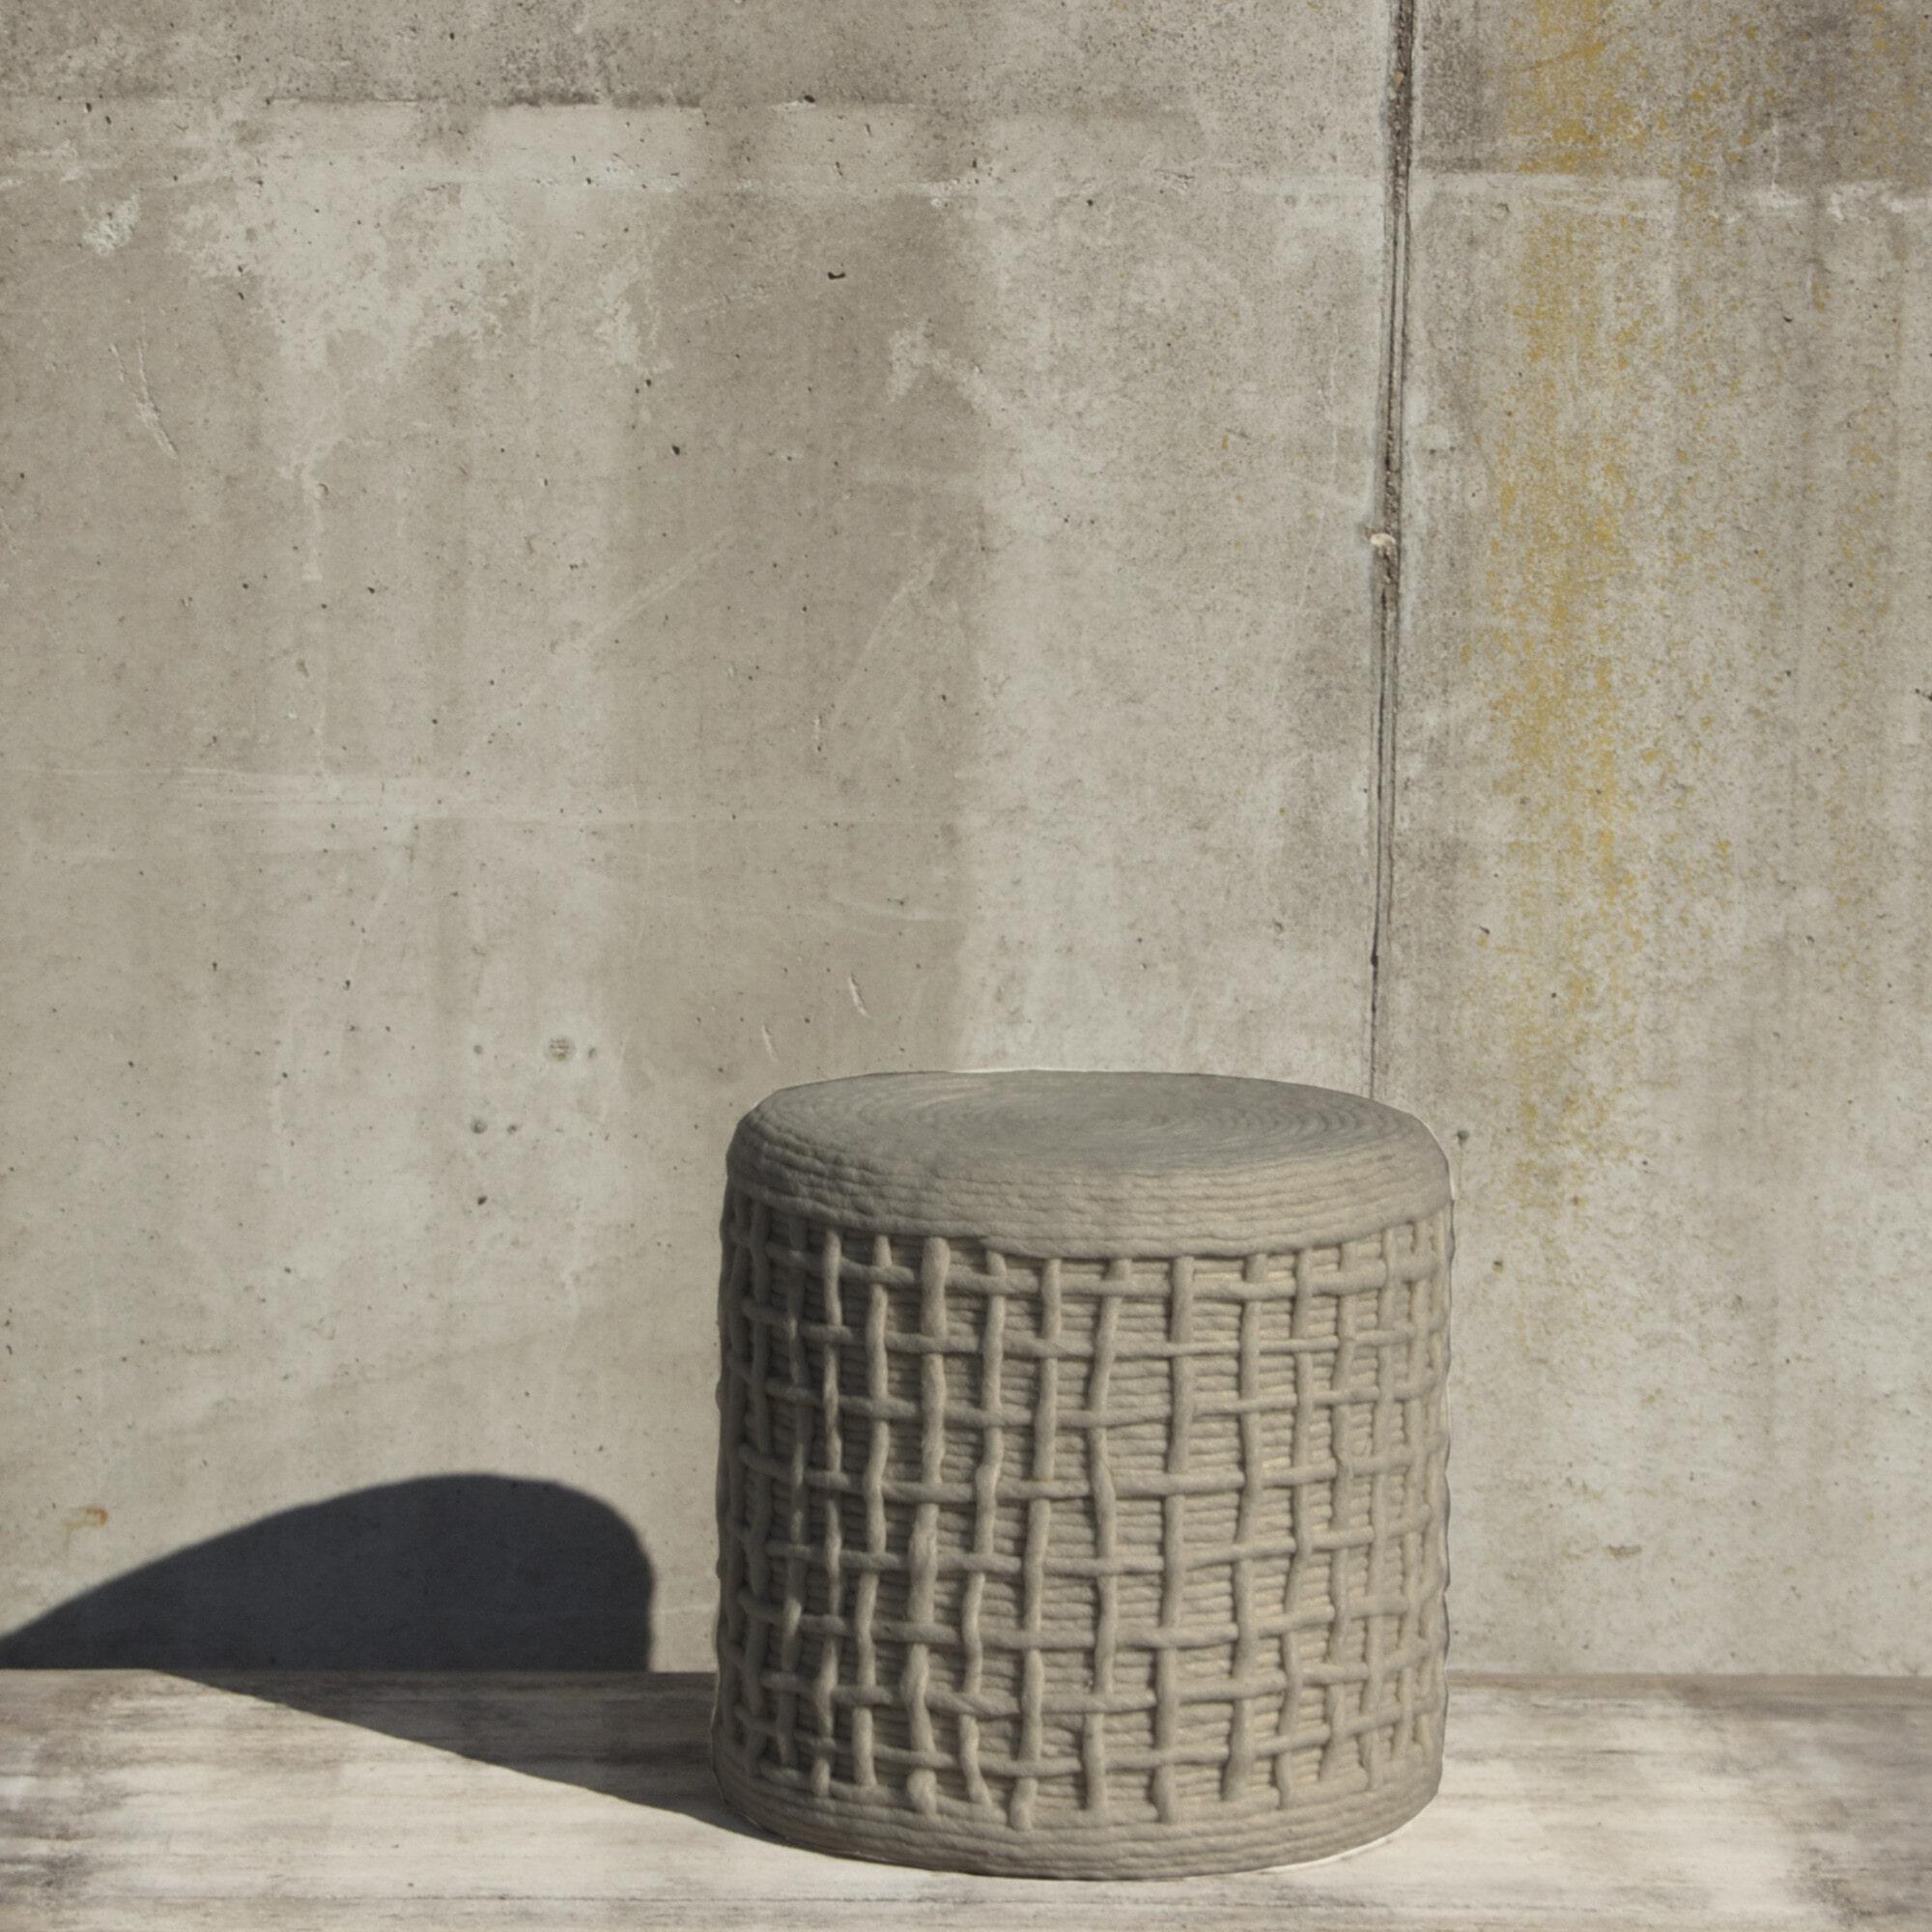 By-Boo Poef 'Wool braided' 40 x 40 x 45cm, kleur beige